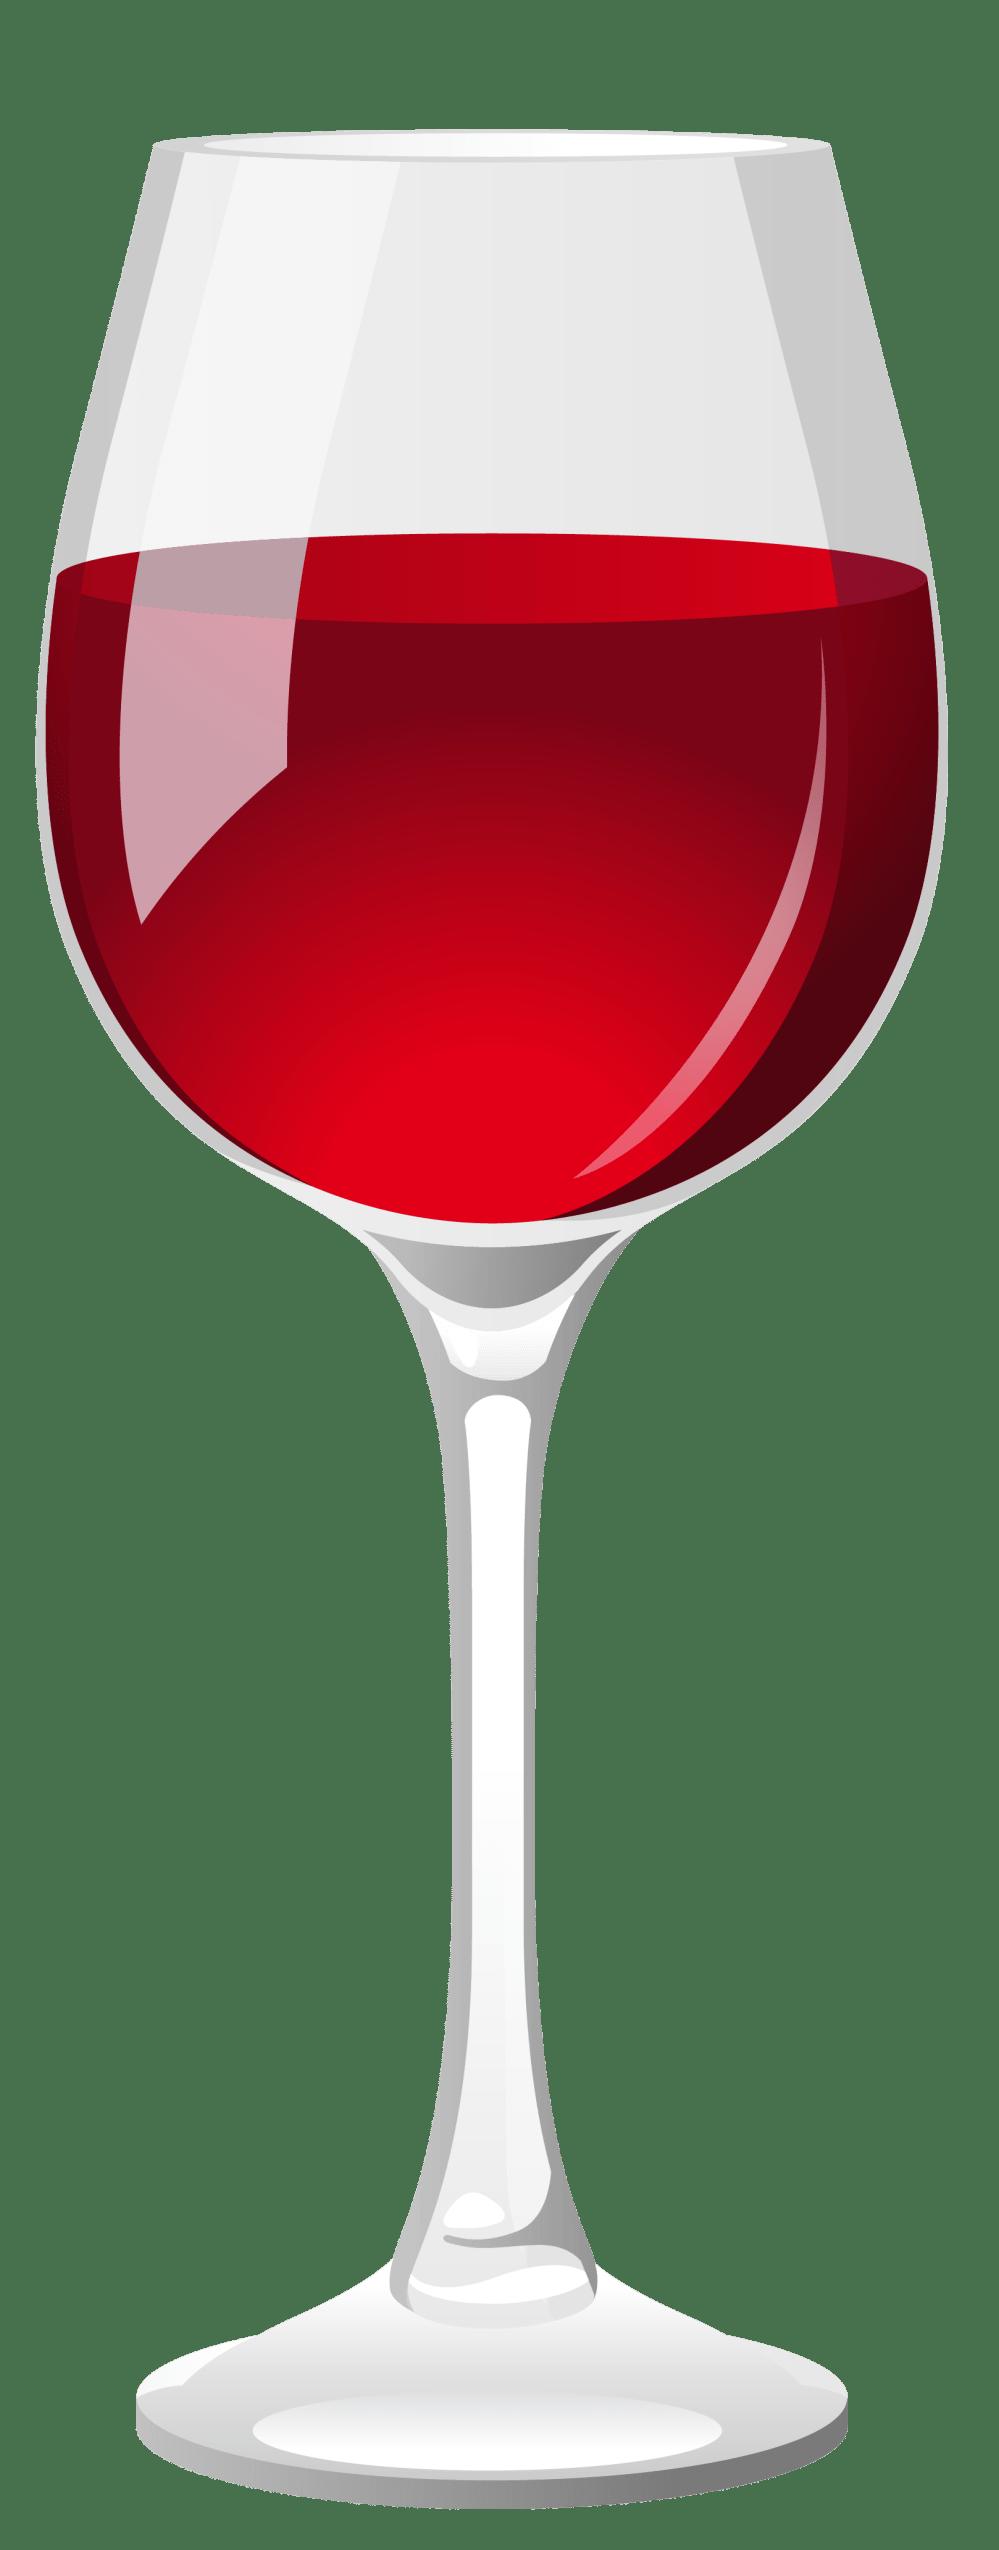 medium resolution of wine clipart wine glass 5